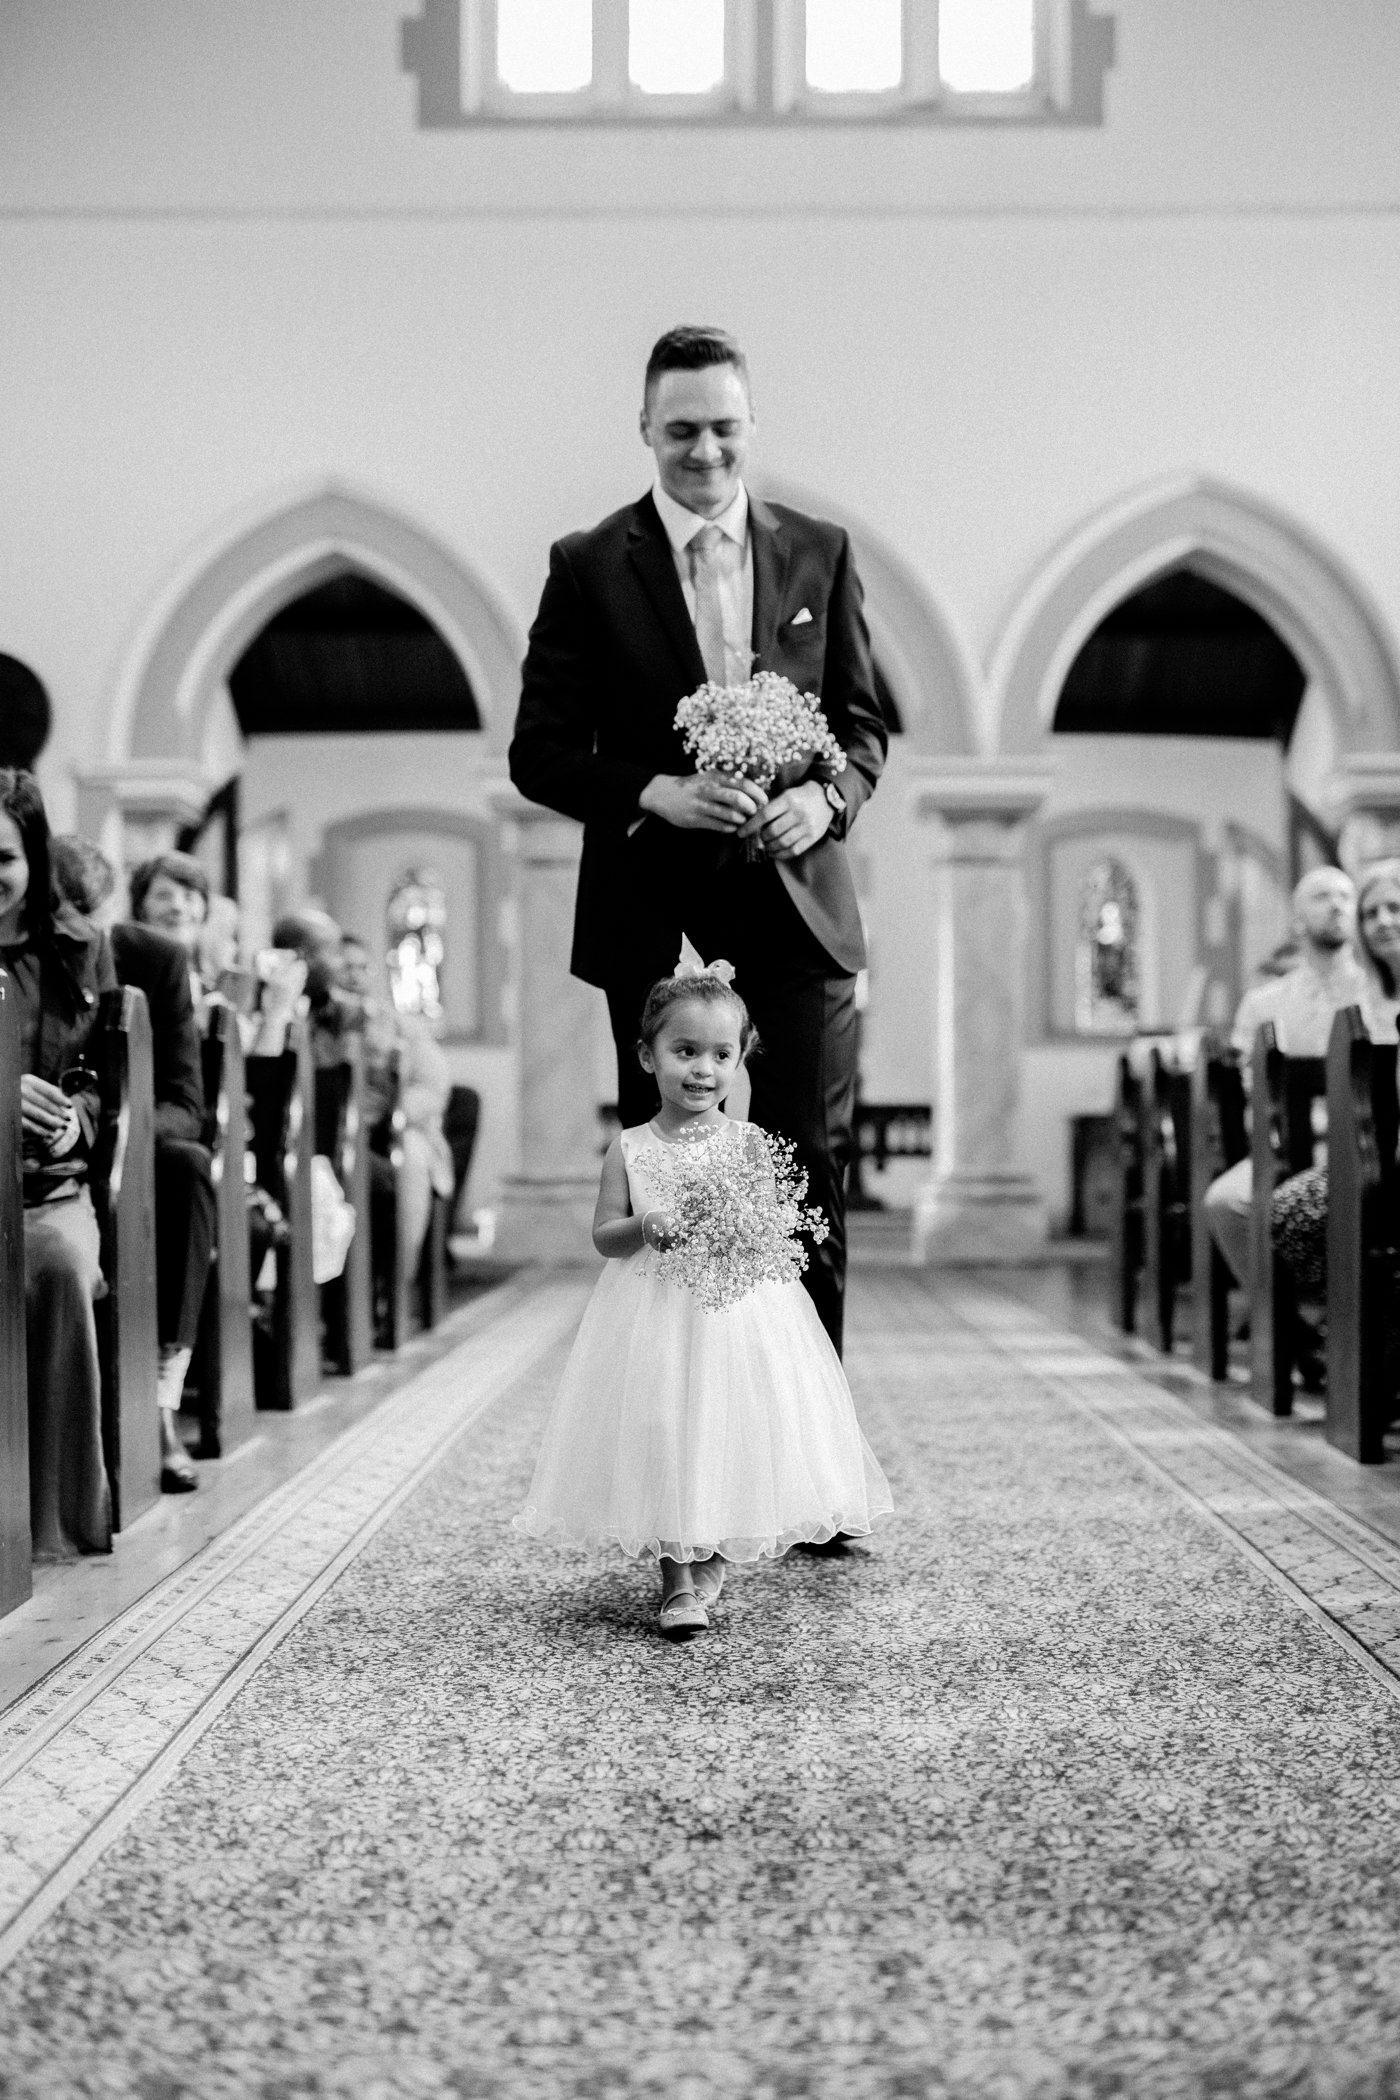 Erin & Ryan - Natural Wedding Photographer in Adelaide - Maximillians Wedding - Simple and Modern Wedding Photographer - Katherine Schultz - www.katherineschultzphotography.com_0012.jpg